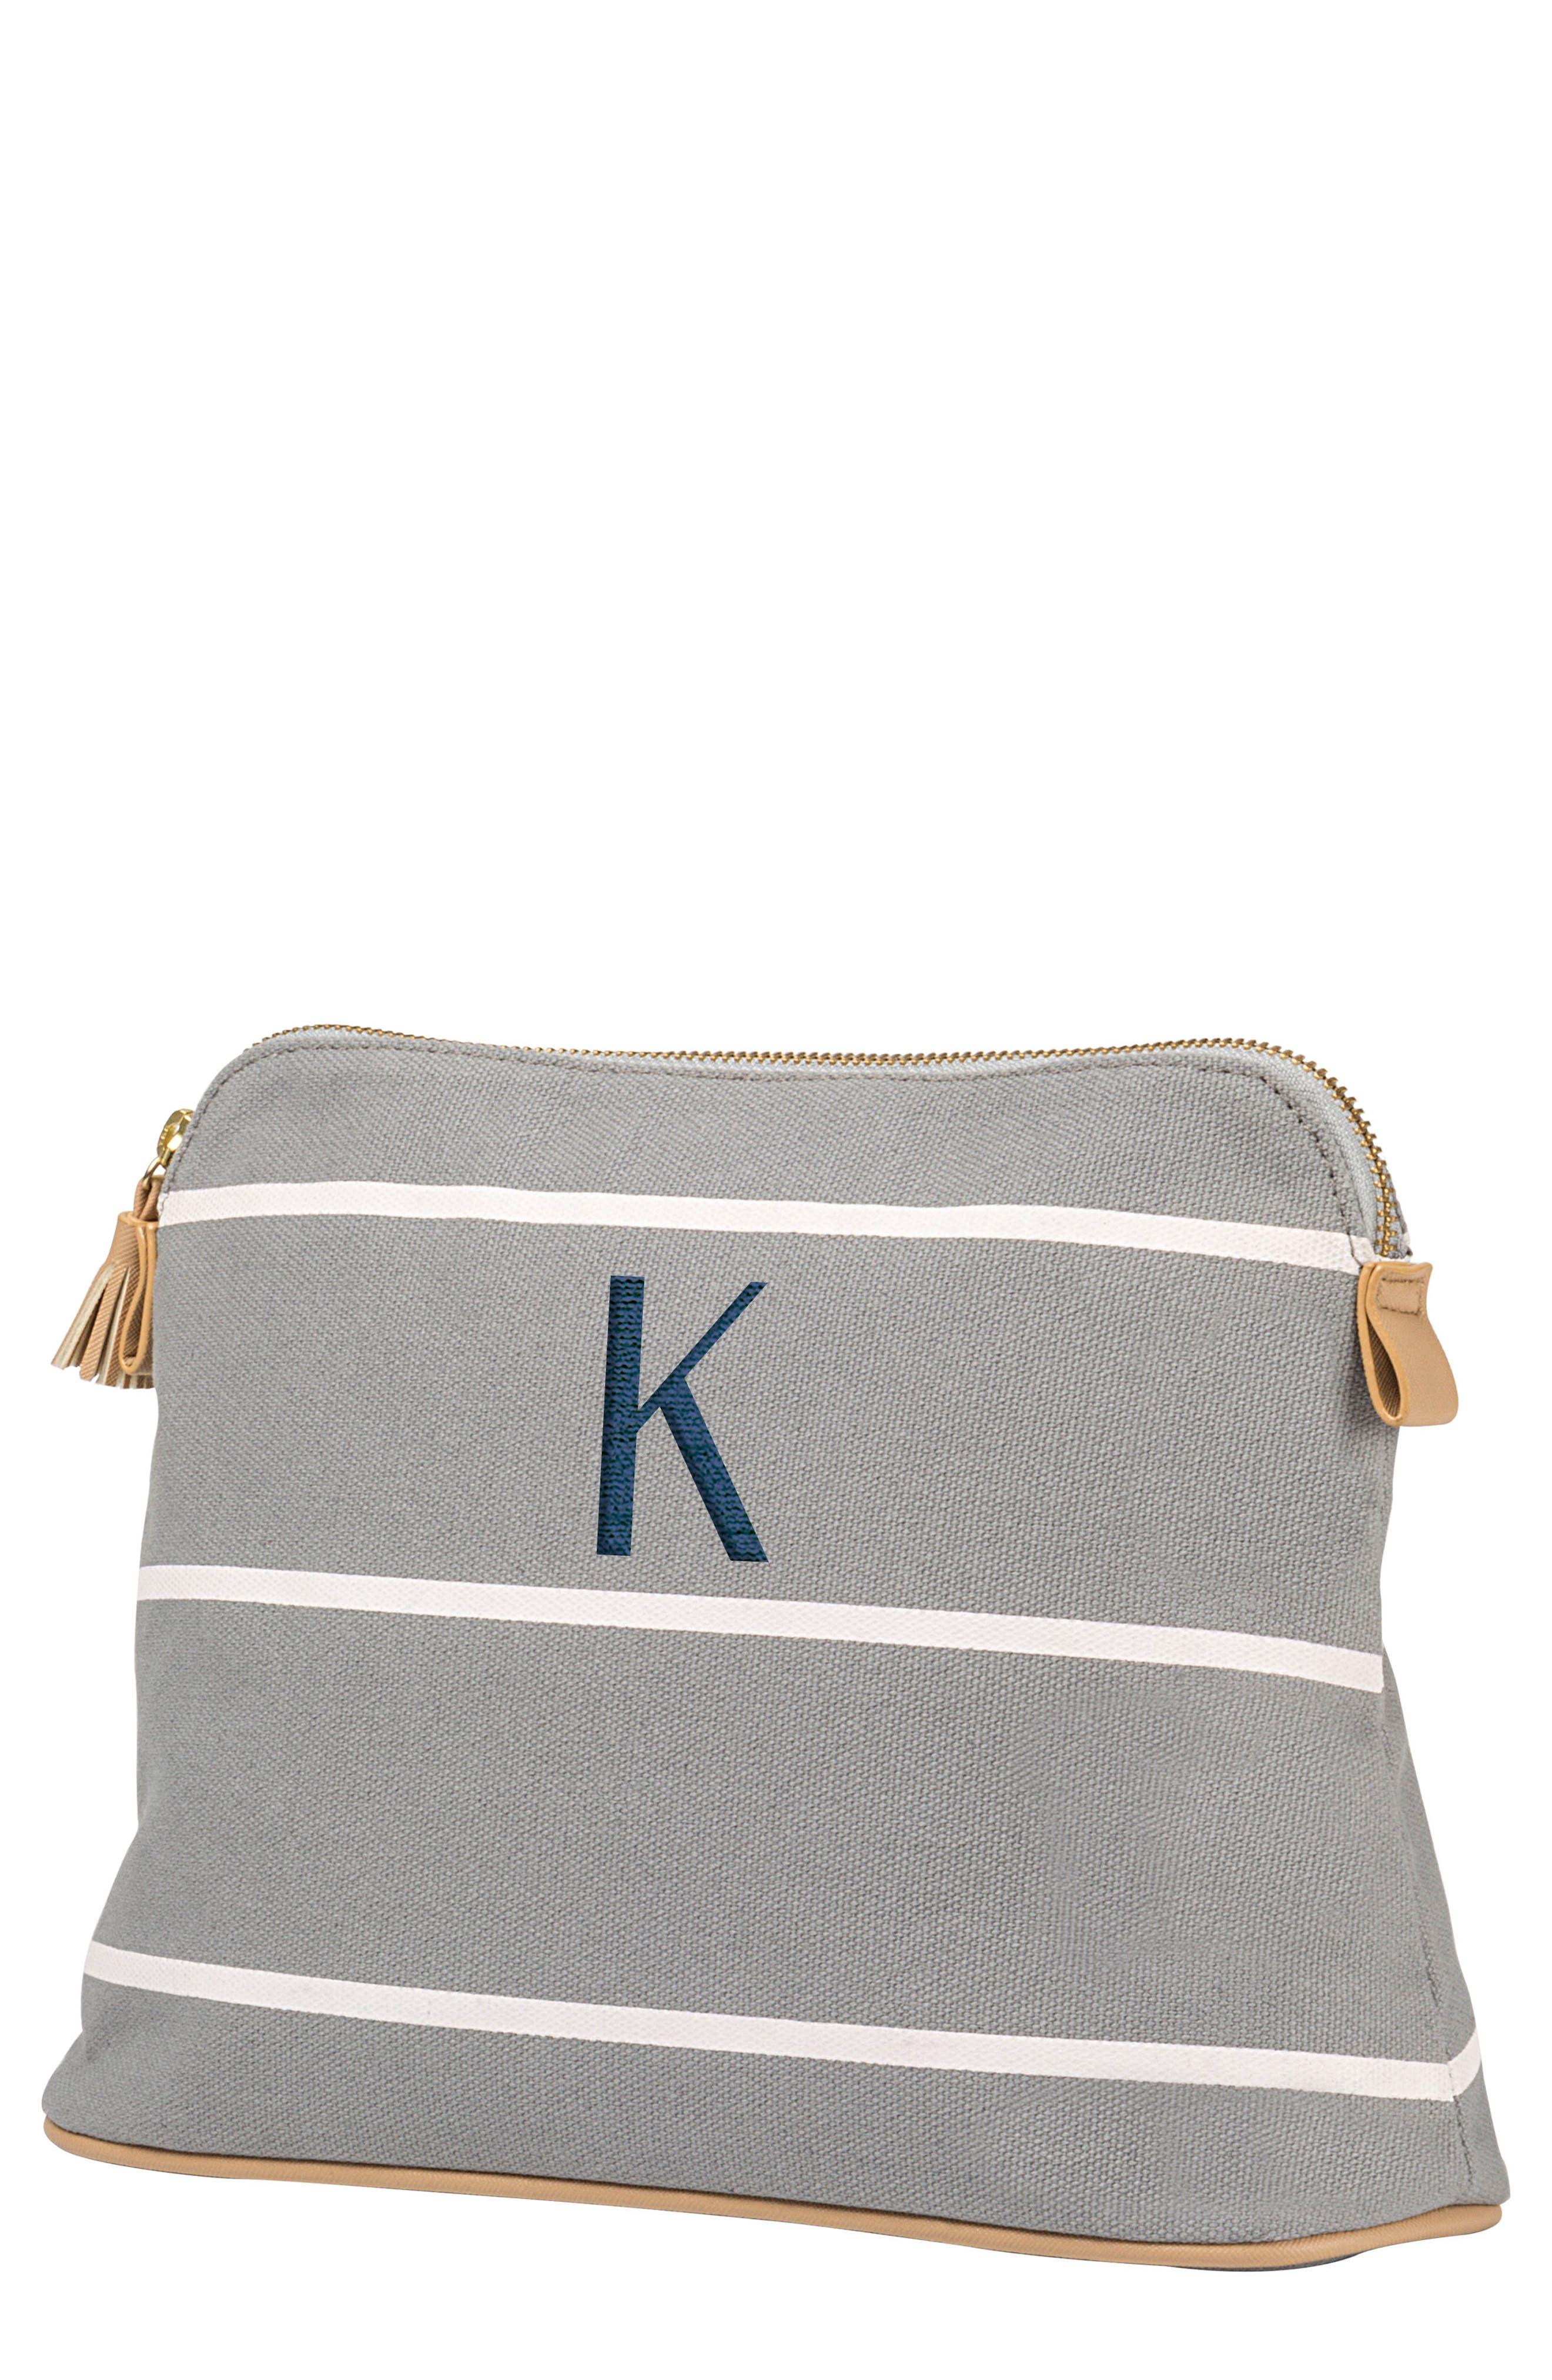 Monogram Cosmetics Bag,                             Main thumbnail 1, color,                             Grey